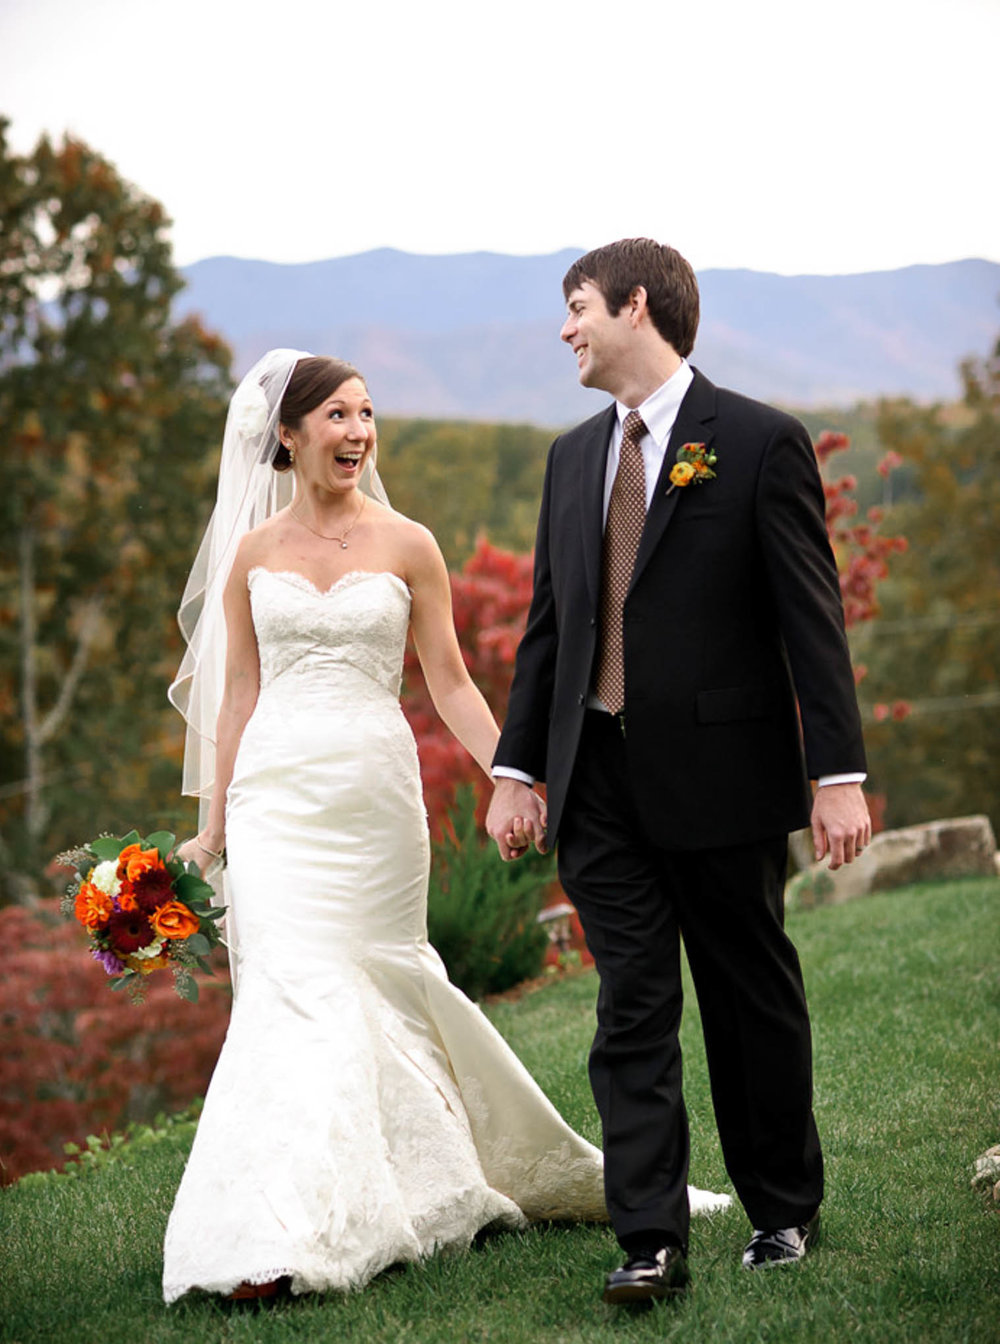 Meg & Chris, October 2010 Wedding